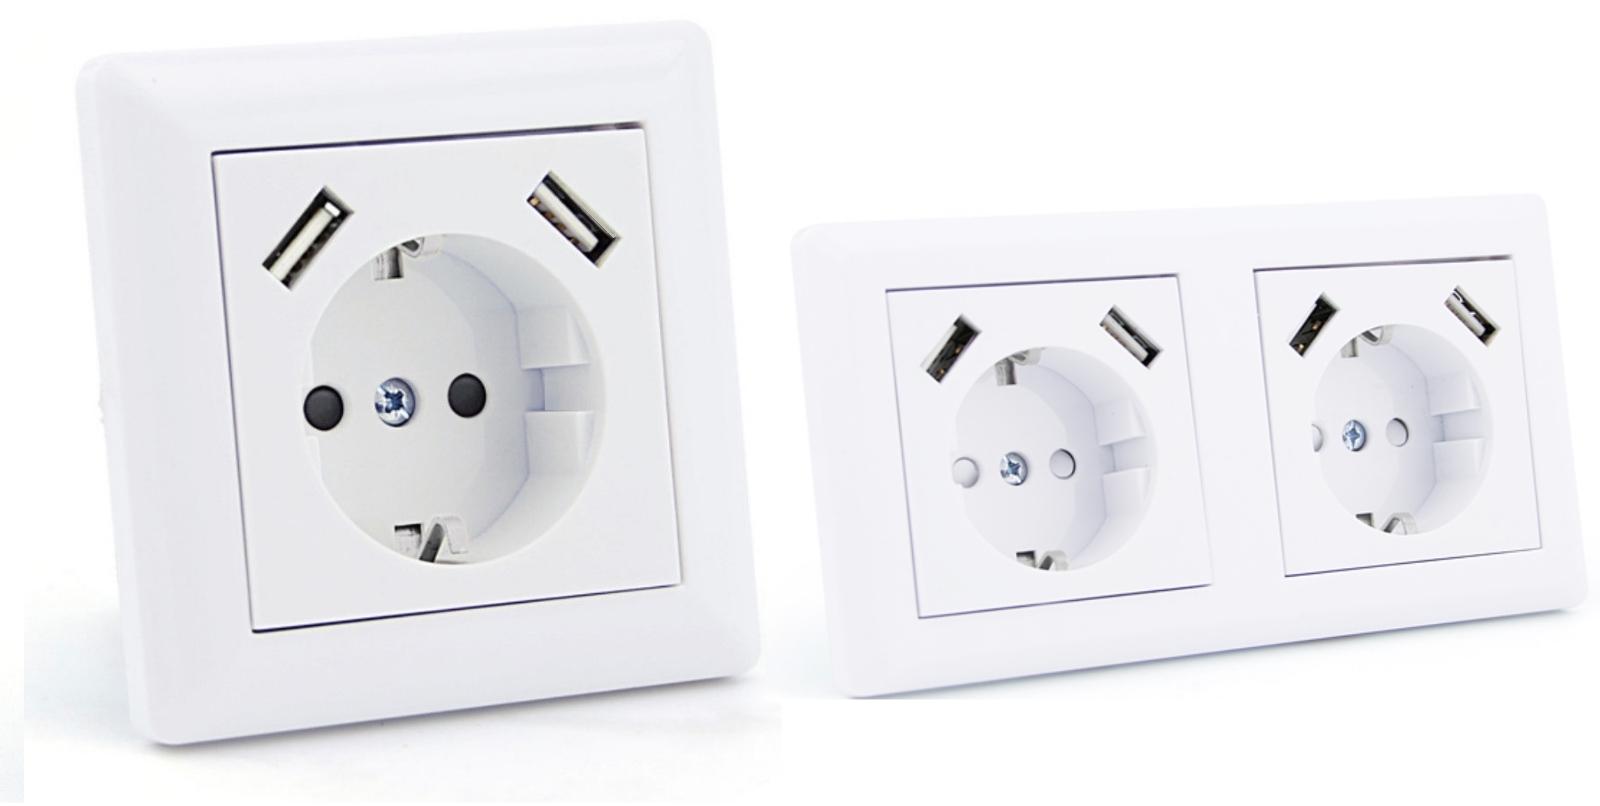 steckdose mit usb anschluss unterputz 2 8a bis 250v. Black Bedroom Furniture Sets. Home Design Ideas